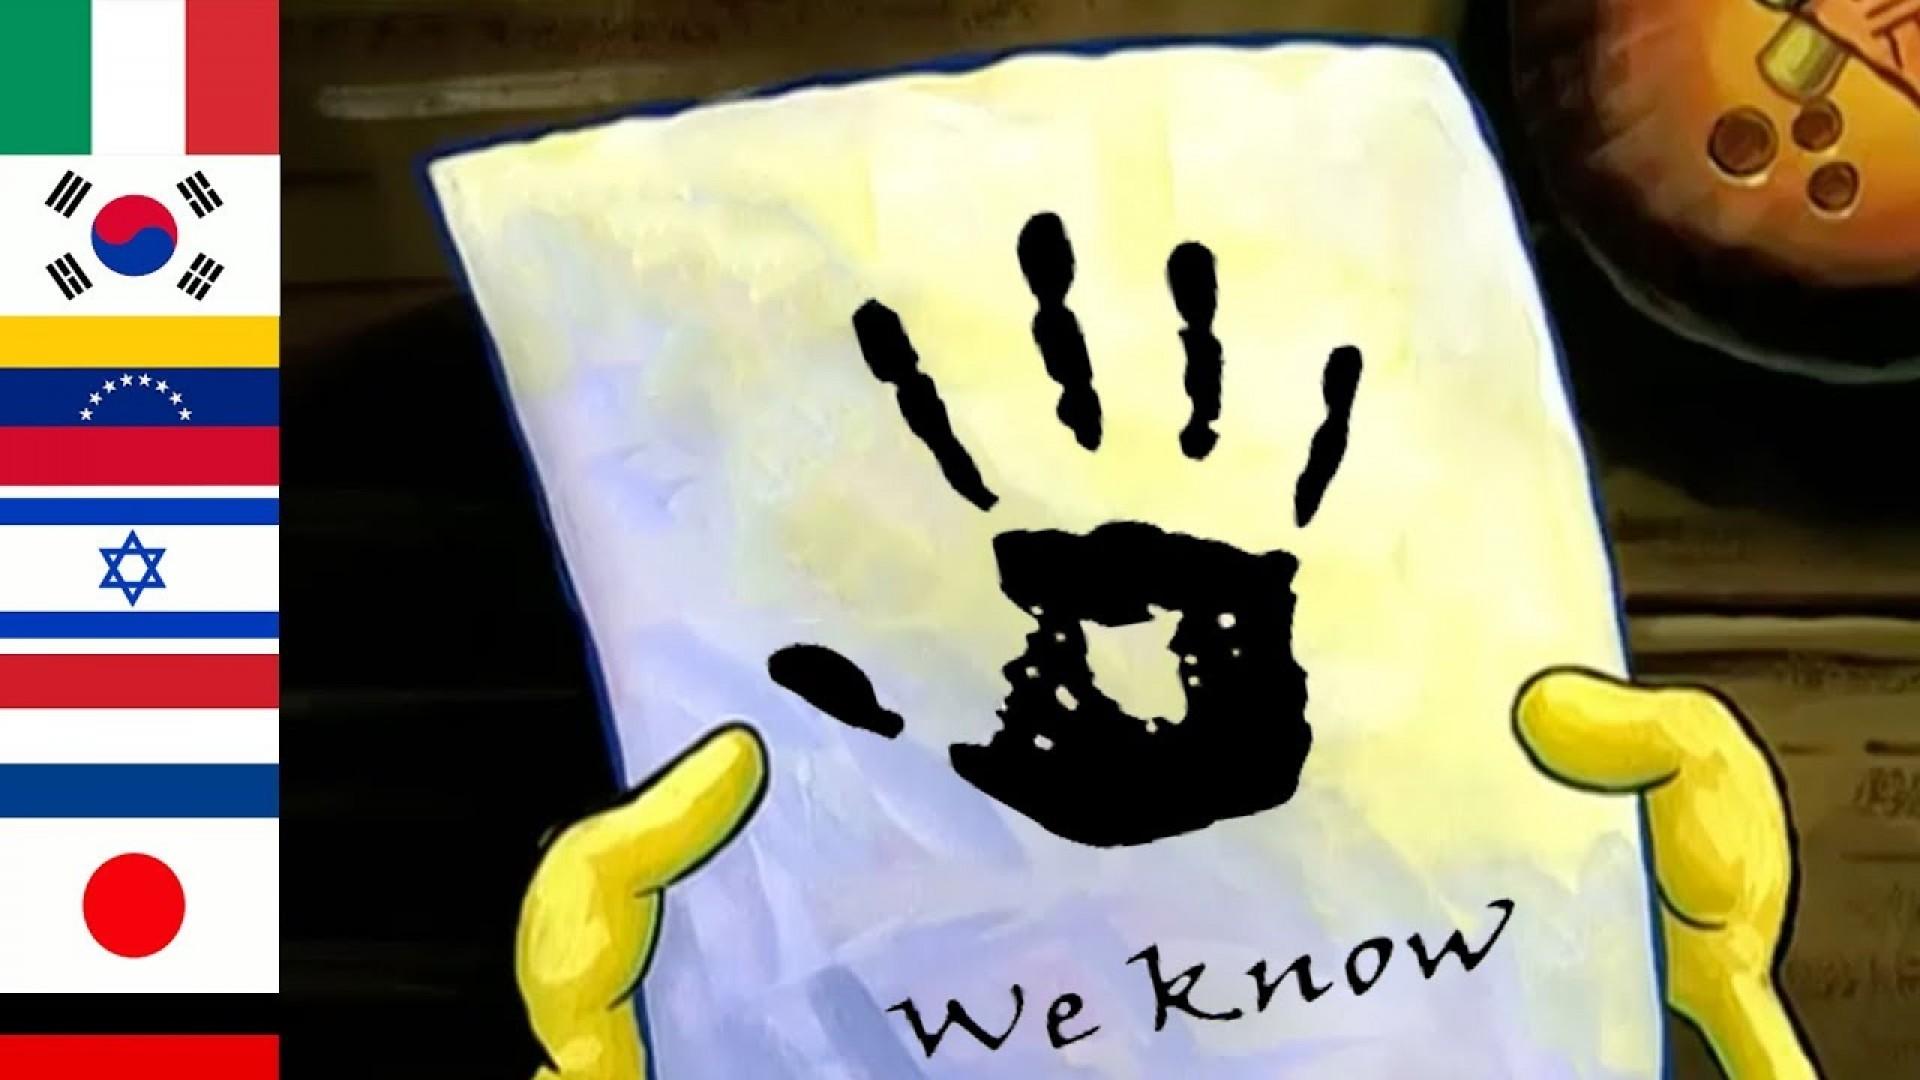 002 Essay Example Spongebob The Unforgettable Copy And Paste Meme Gif Tumblr 1920